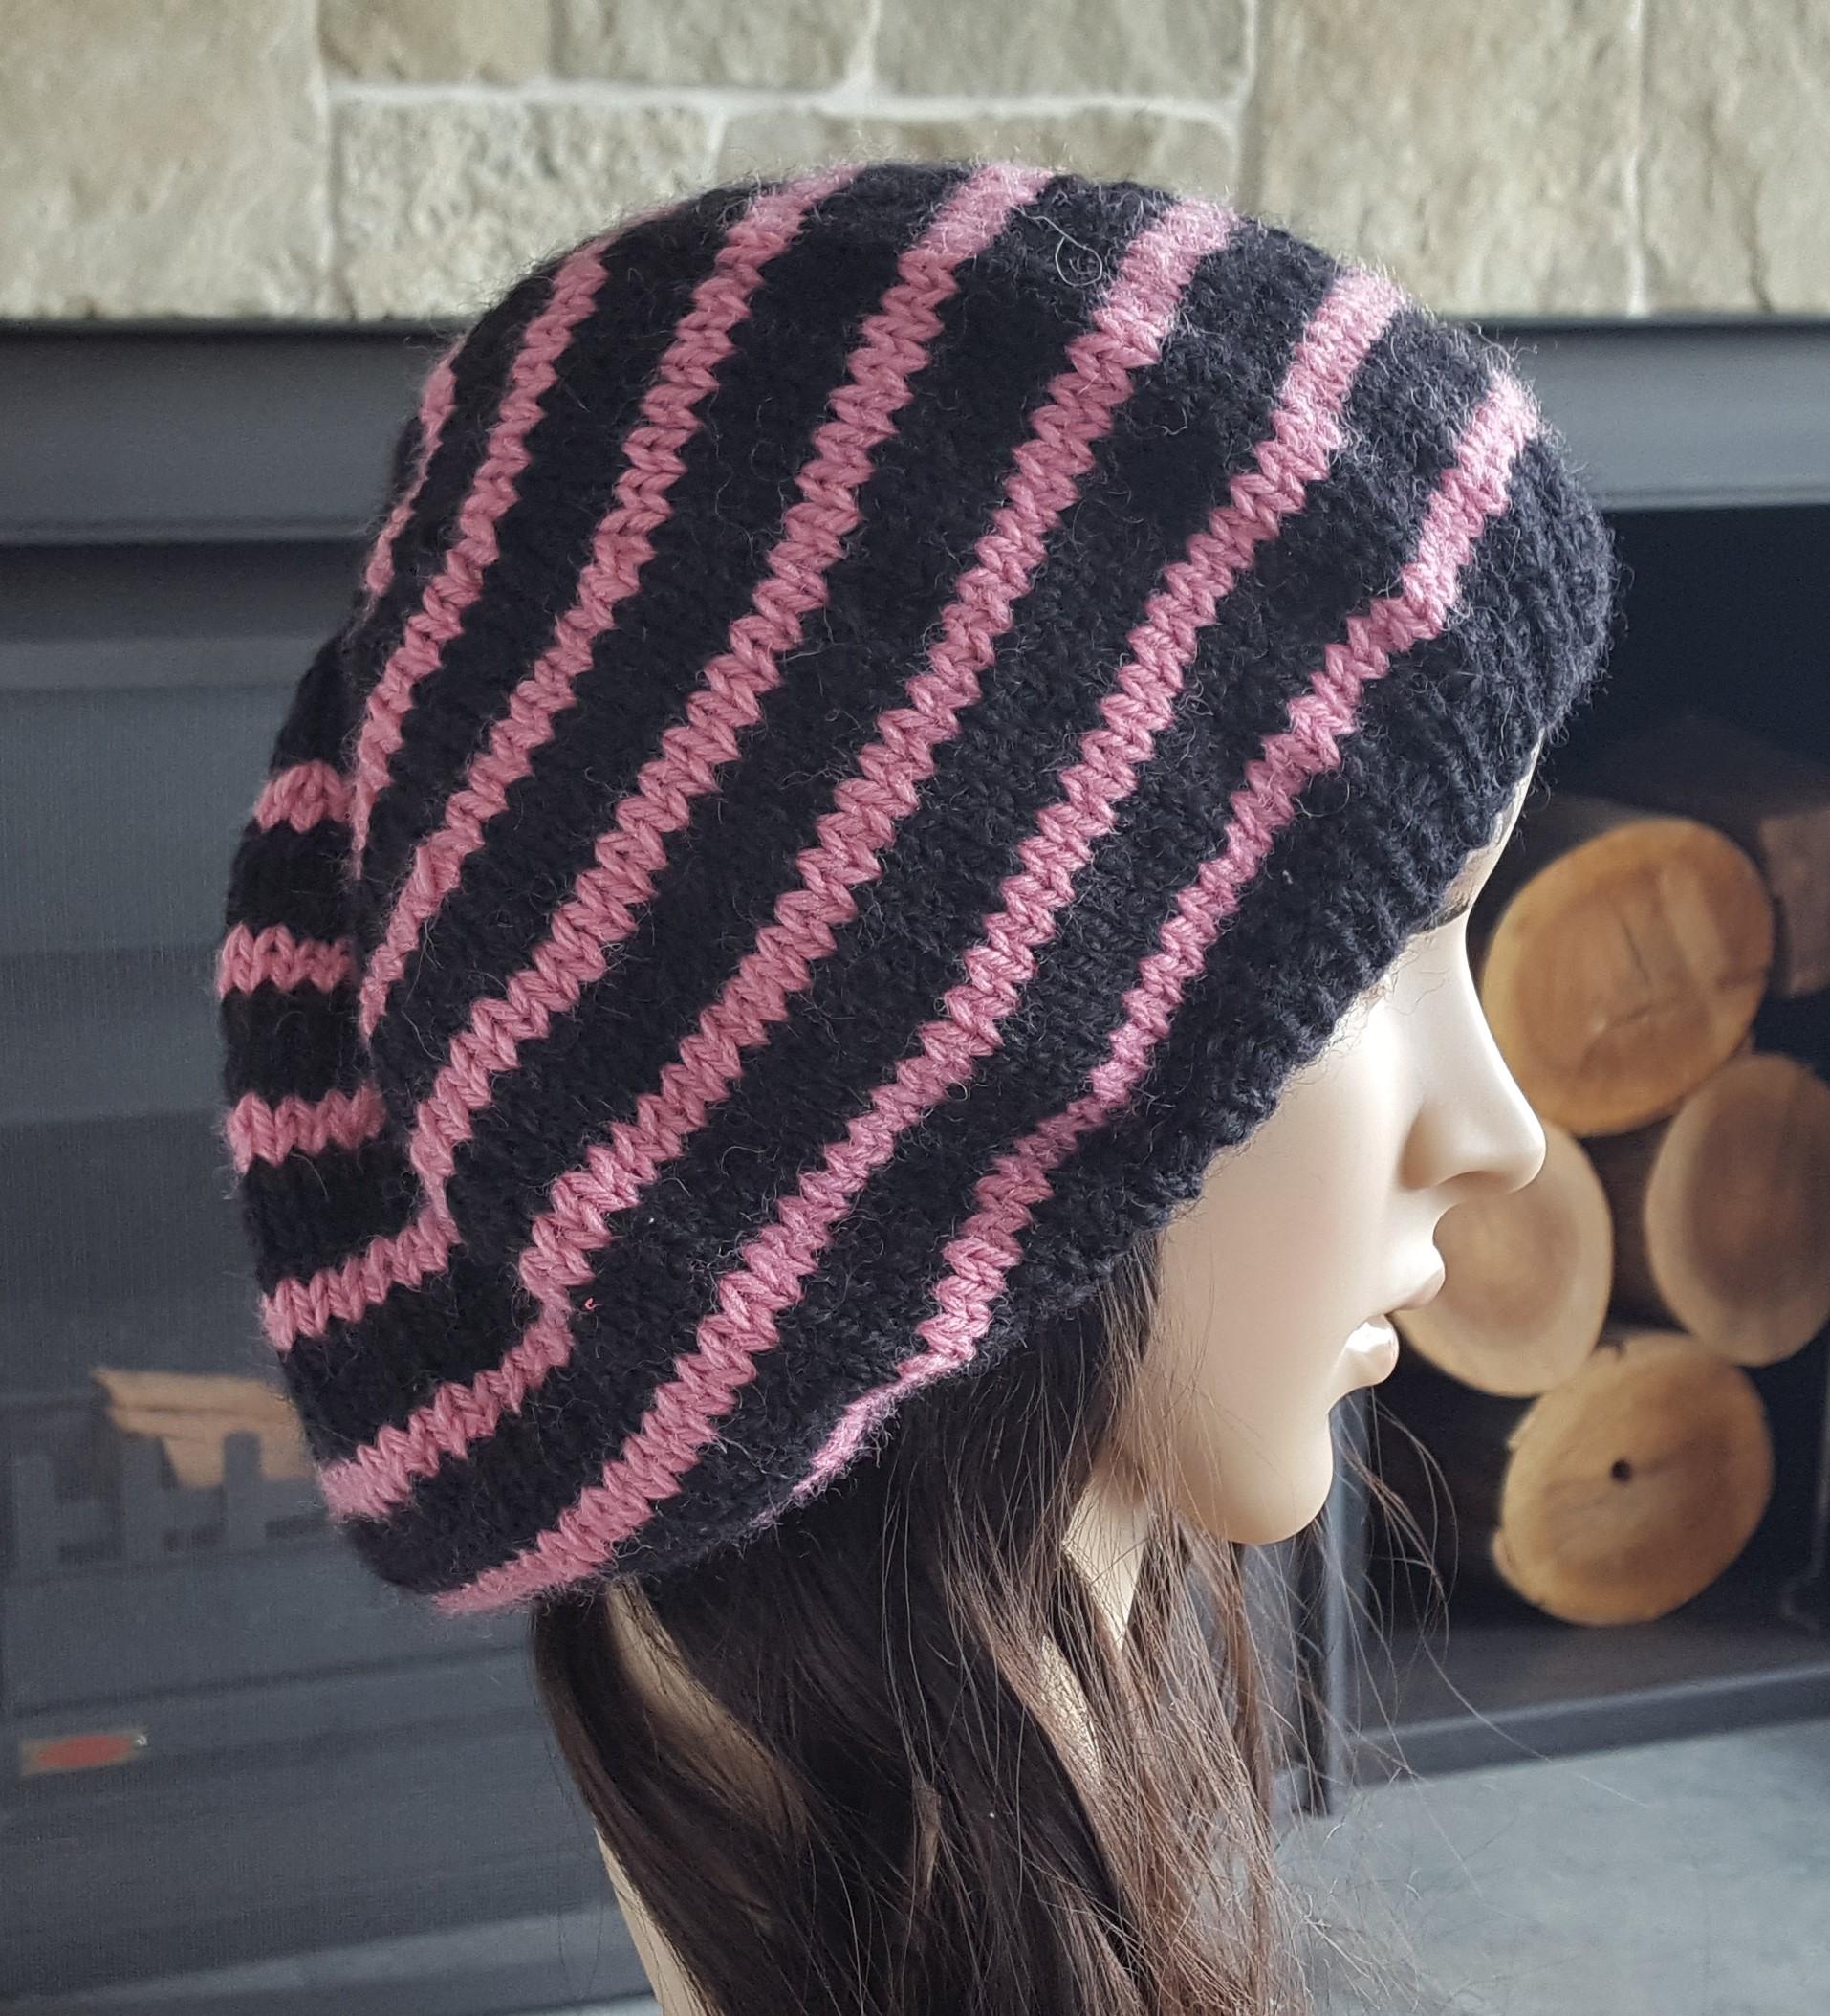 Balaclava Knitting Pattern 2 Needles : Knitting Patterns Online - Knitted Beanie, Scarf and Headband Patterns